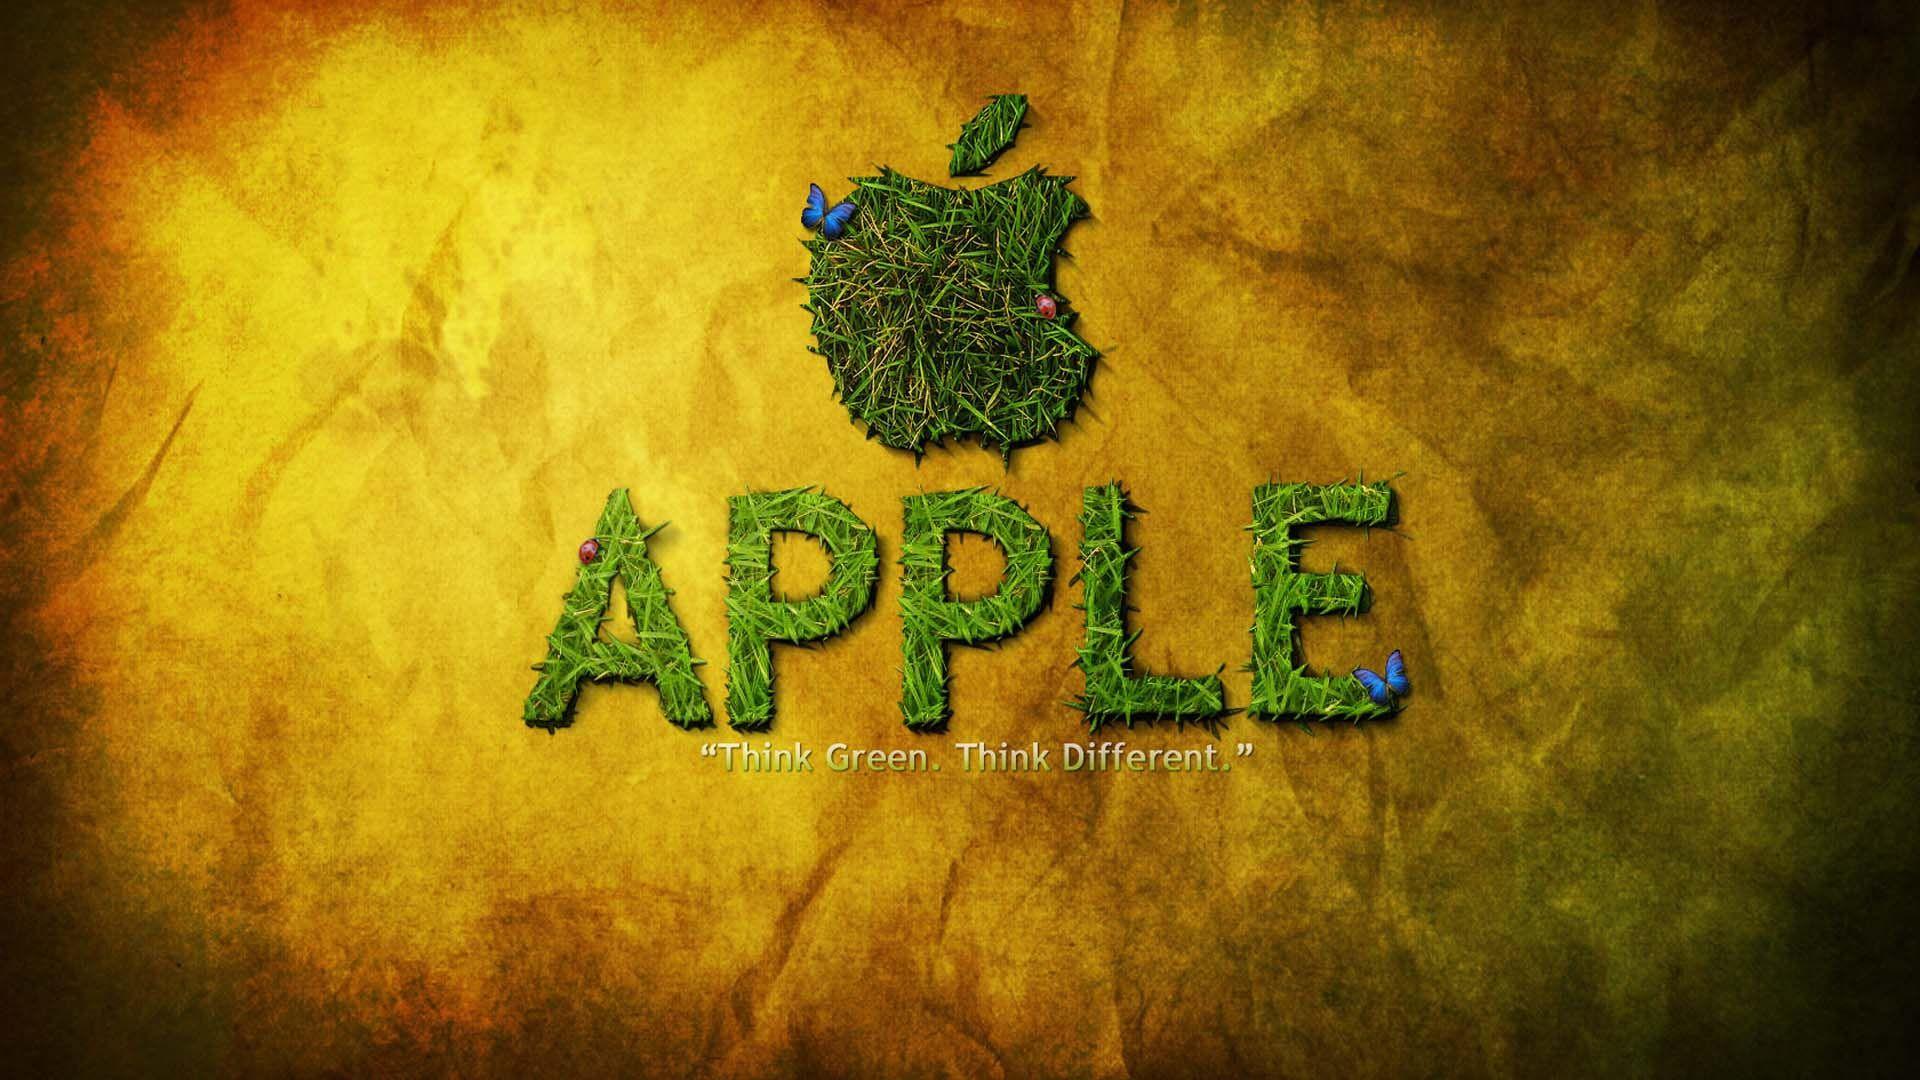 ipad iphone development company mobile development software ios application wallpaper application a· apple wallpaperfree desktop